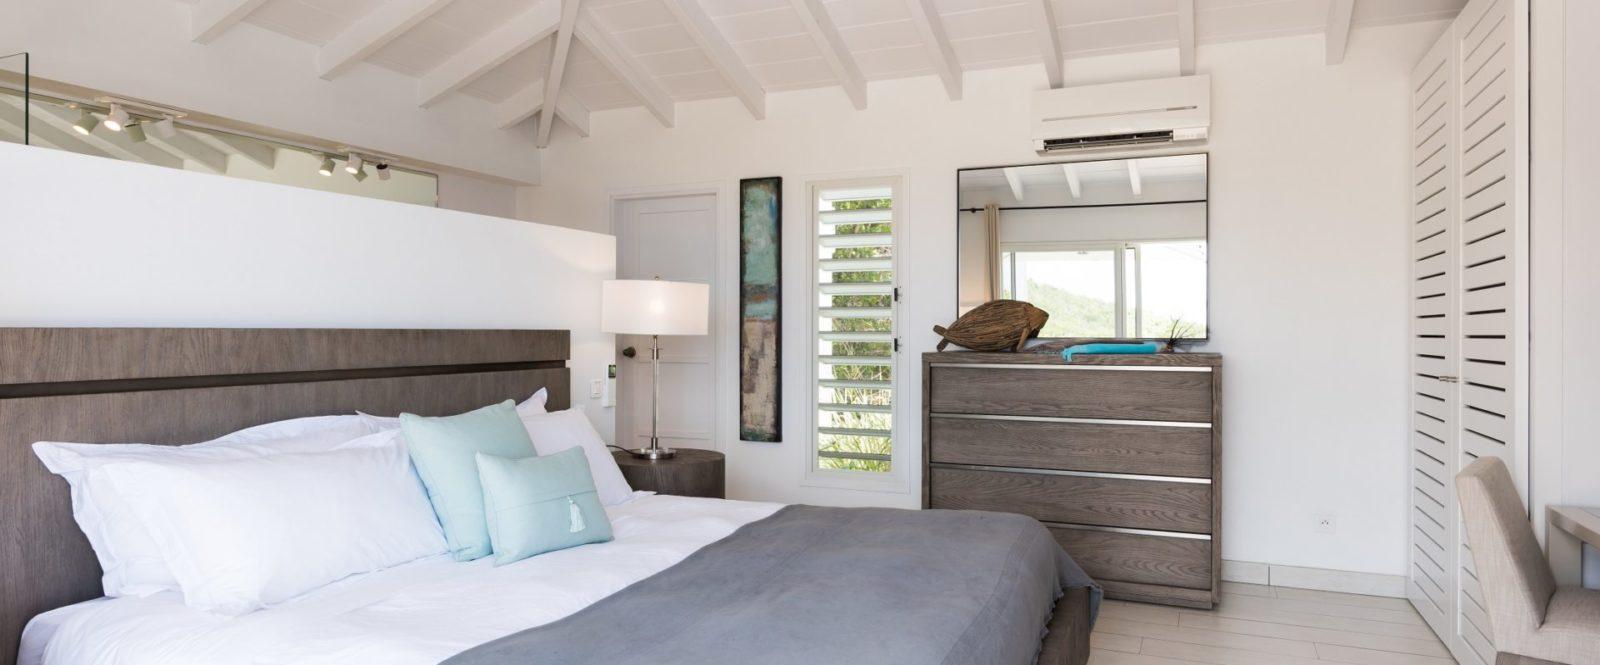 AVALON - villa-avalon-jeanne-le-menn-bedroom-3-1